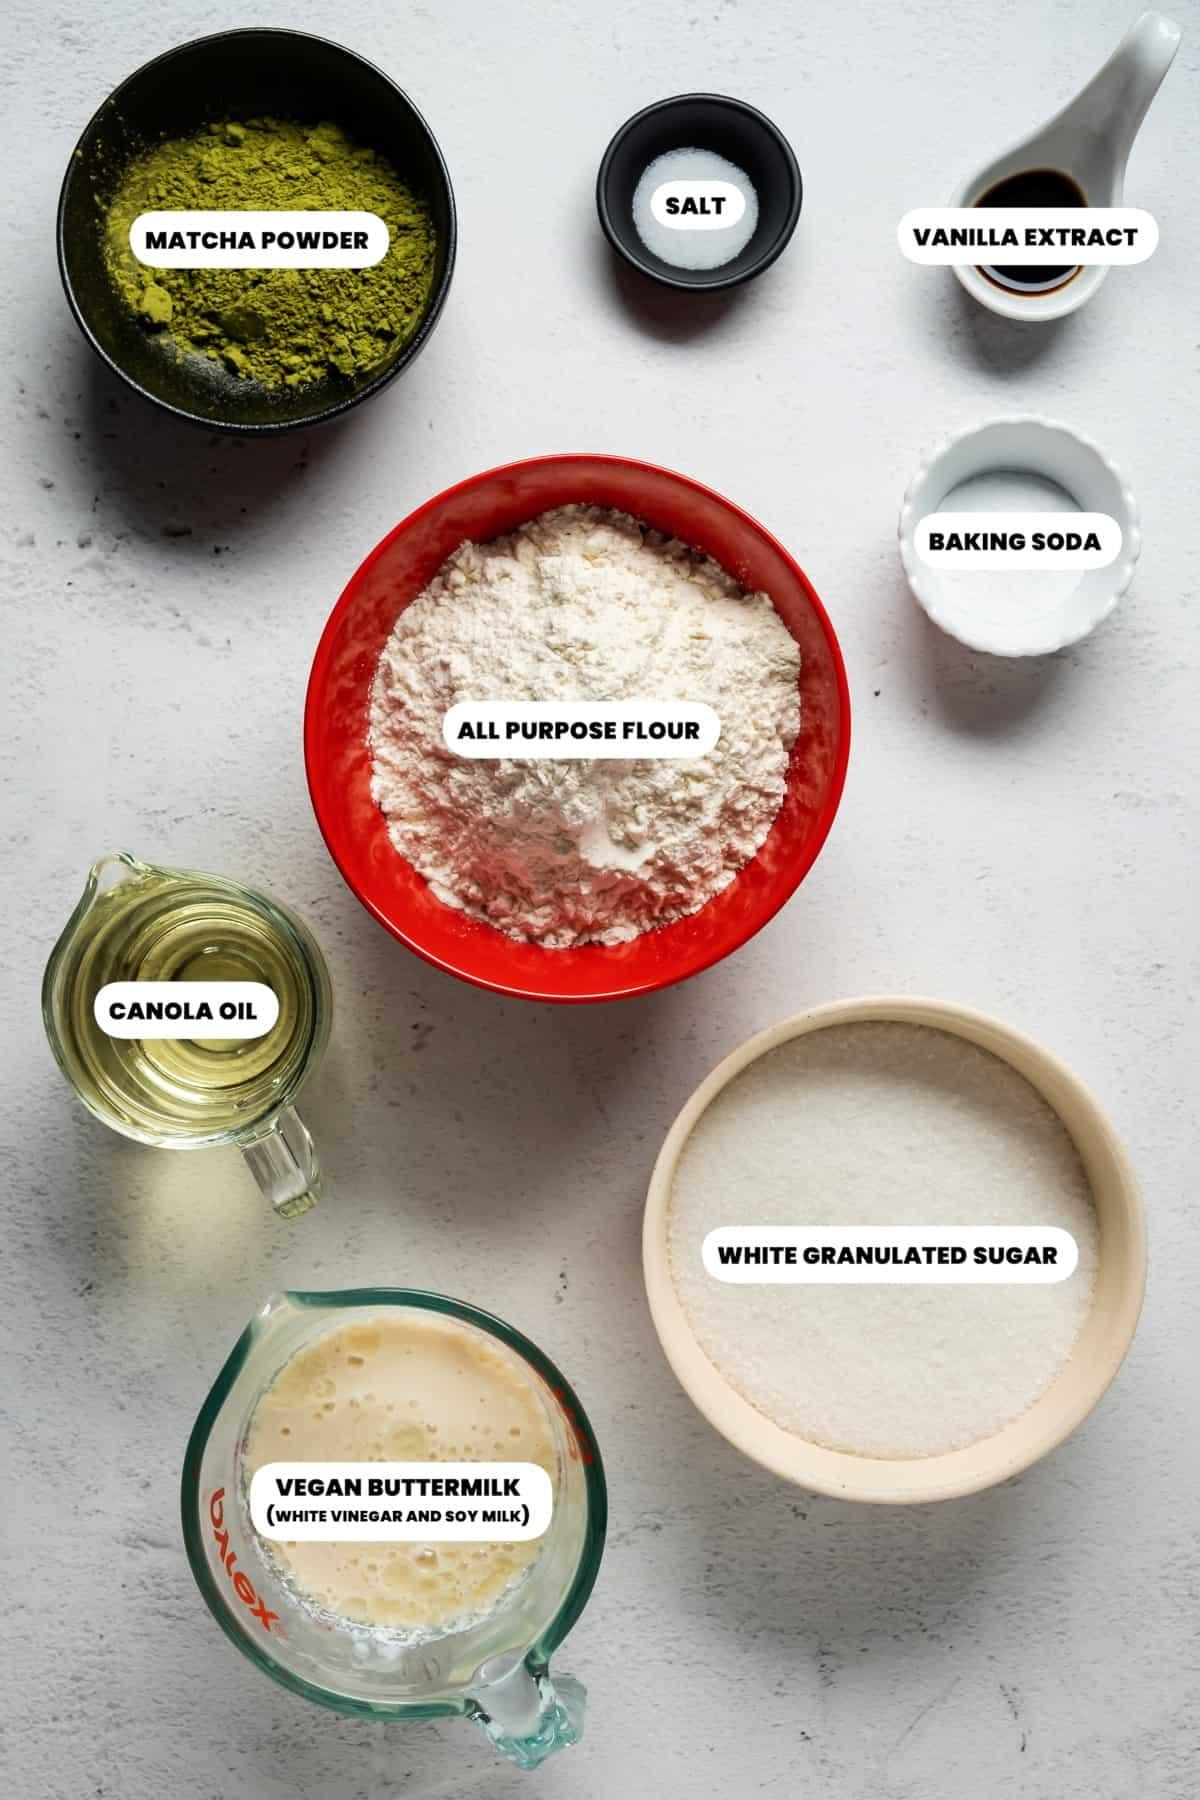 Photo of the ingredients needed to make vegan matcha cupcakes.